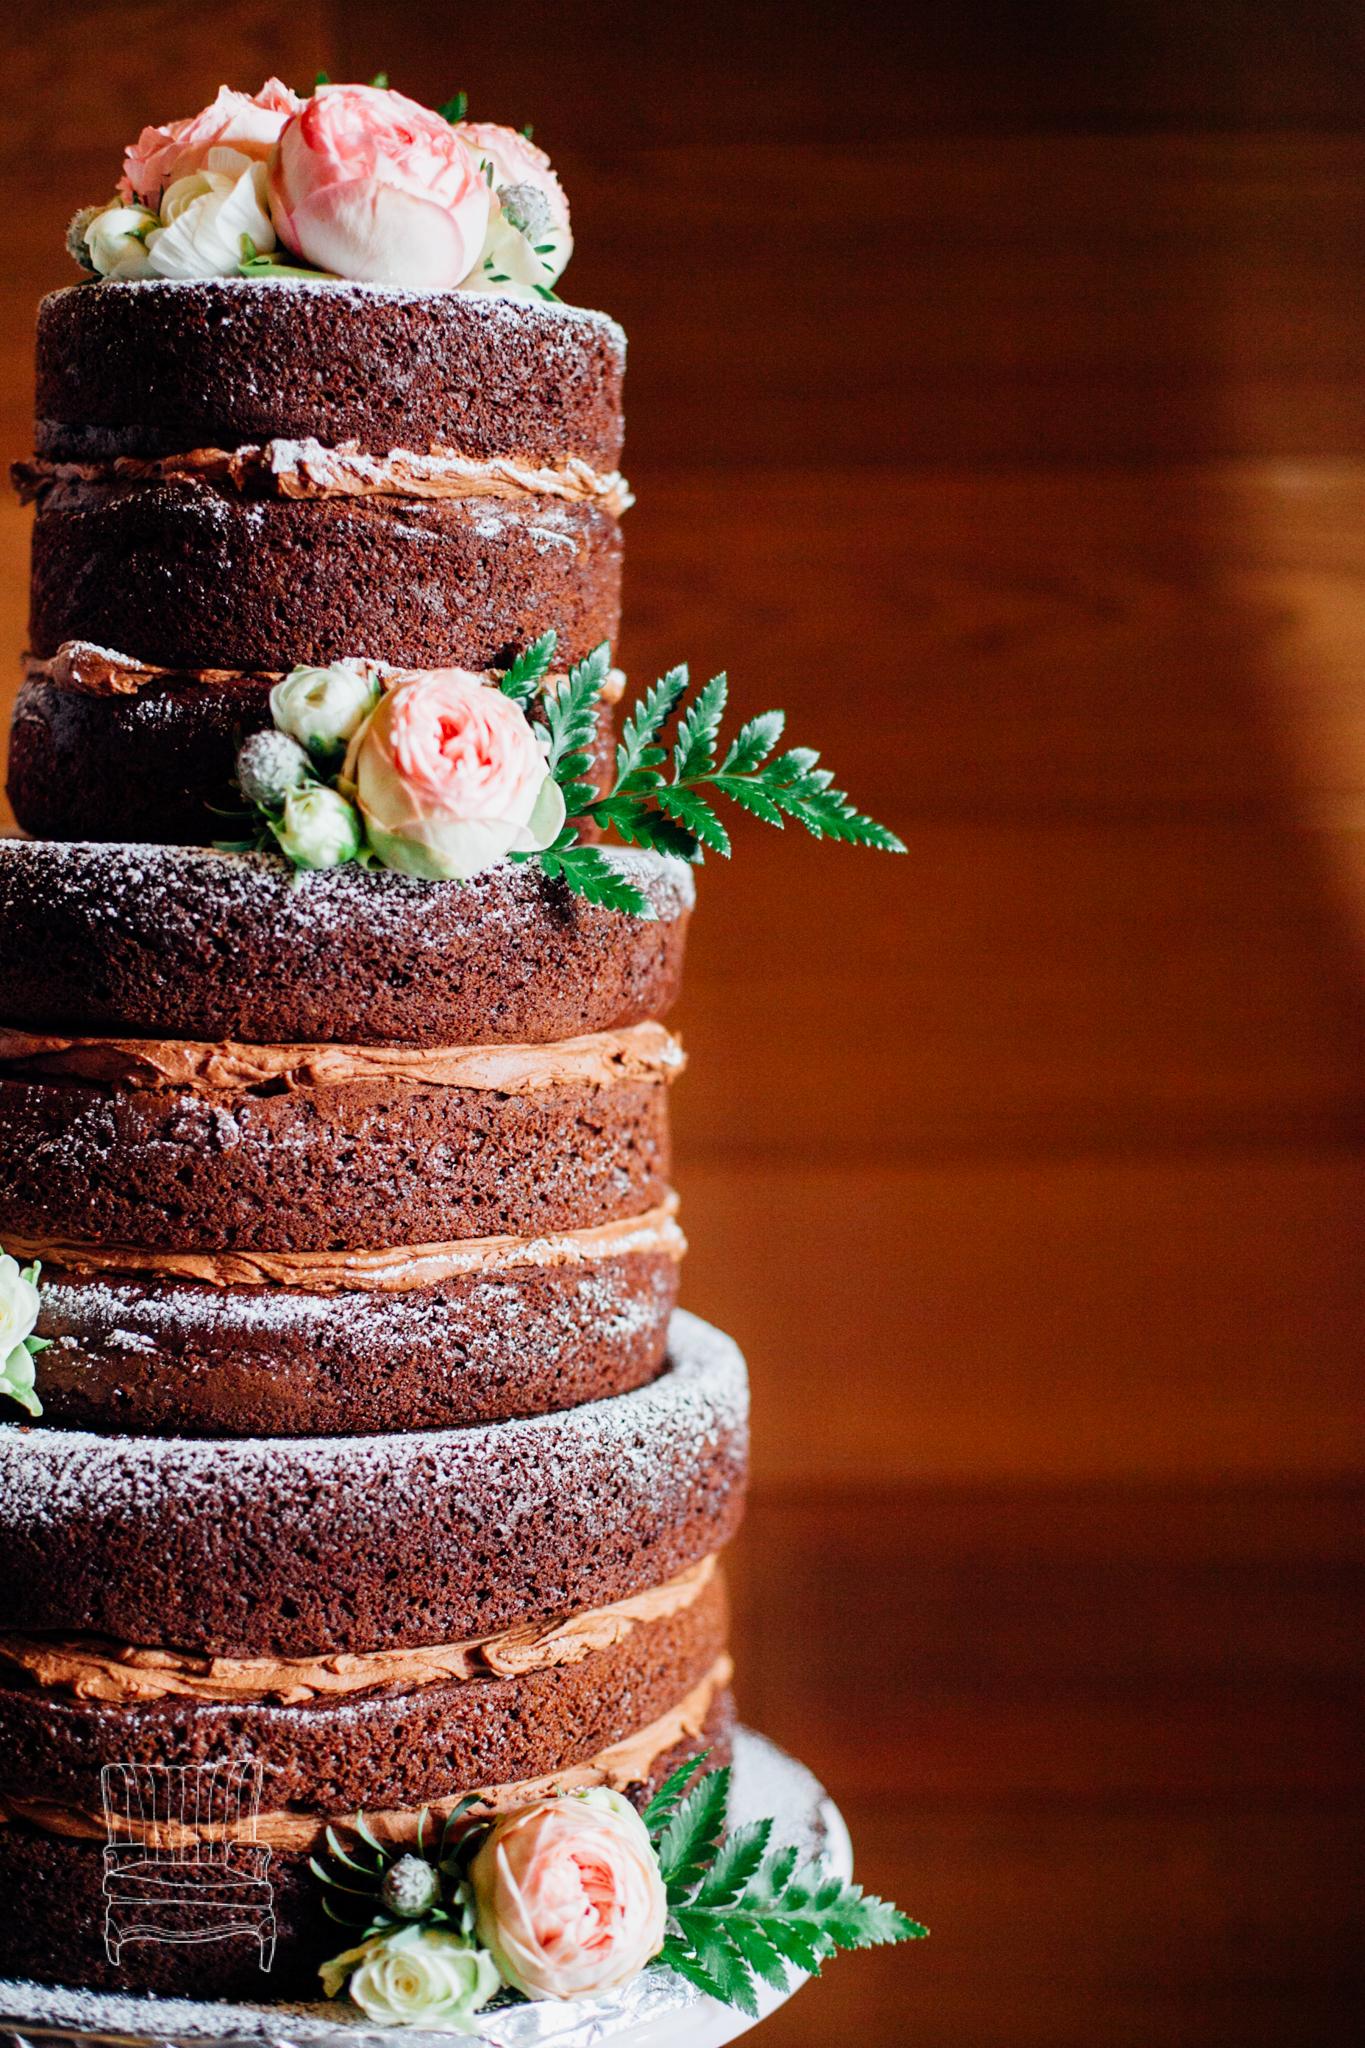 seattle-wedding-photographer-katheryn-moran-russells-bothell-wilkins-wedding-photo-44.jpg